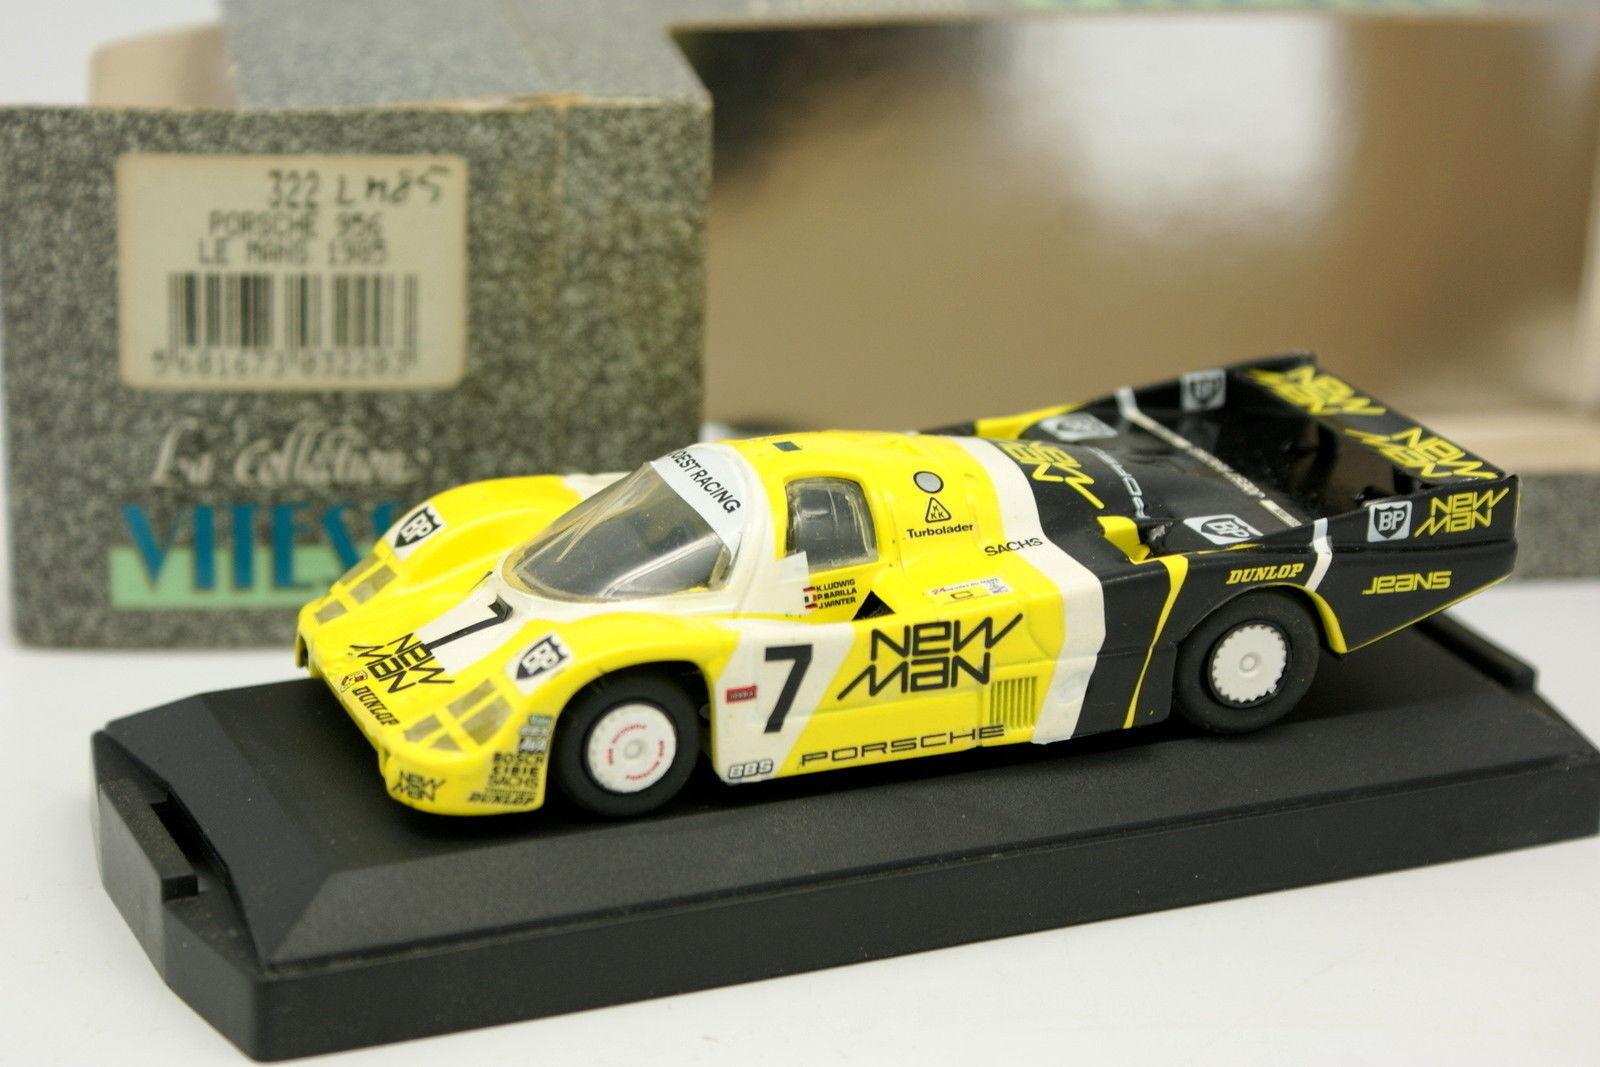 Vitesse 1 1 1 43 - Porsche 956 Nuovo Man No.7 Le Mans 1985 74ac14